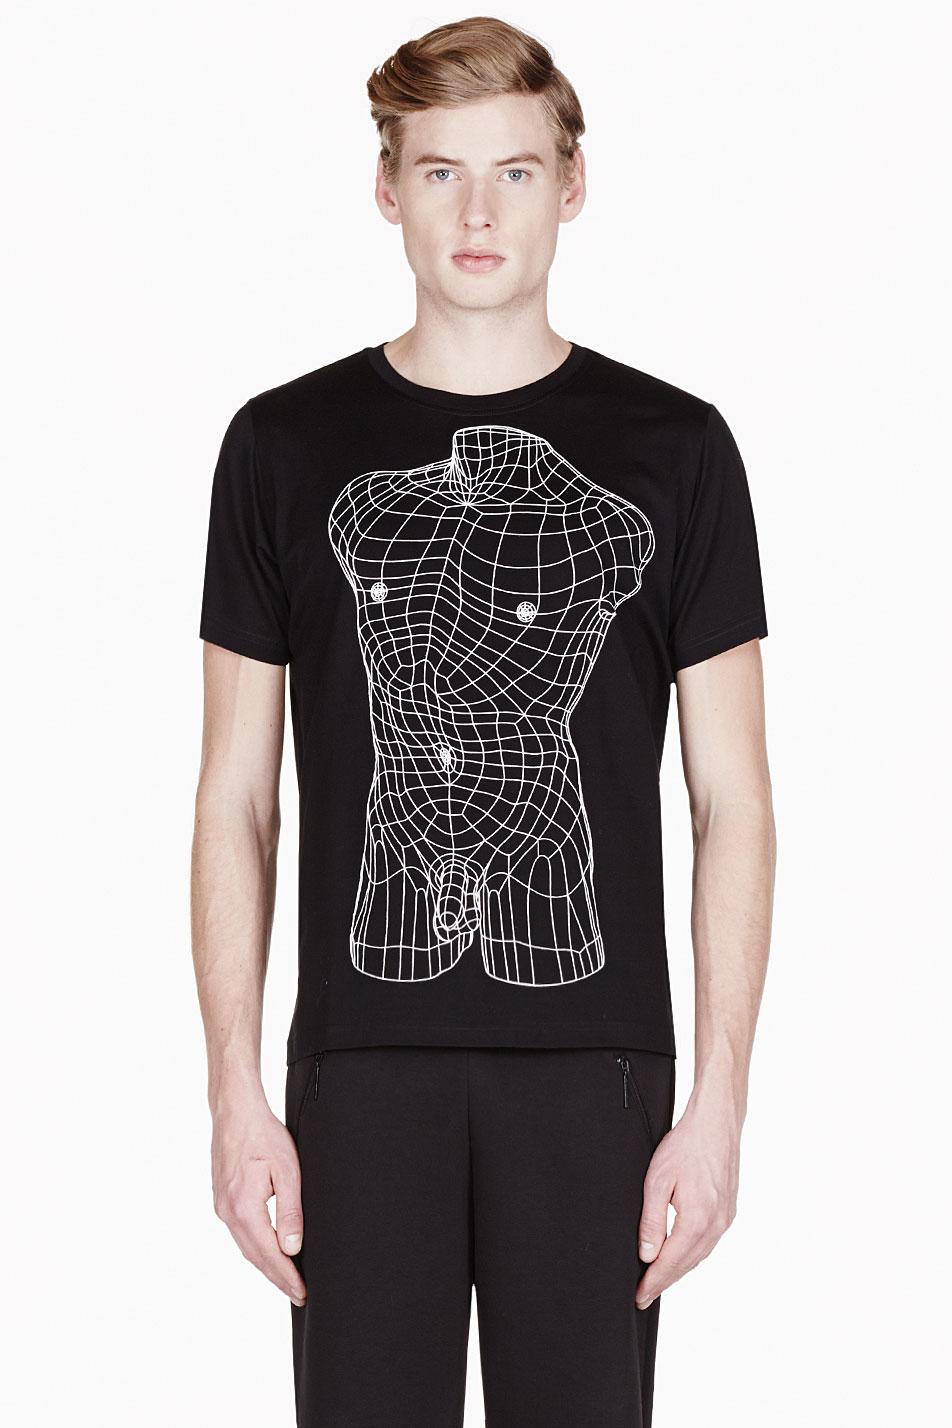 christopher kane black geometric male nude print t_shirt